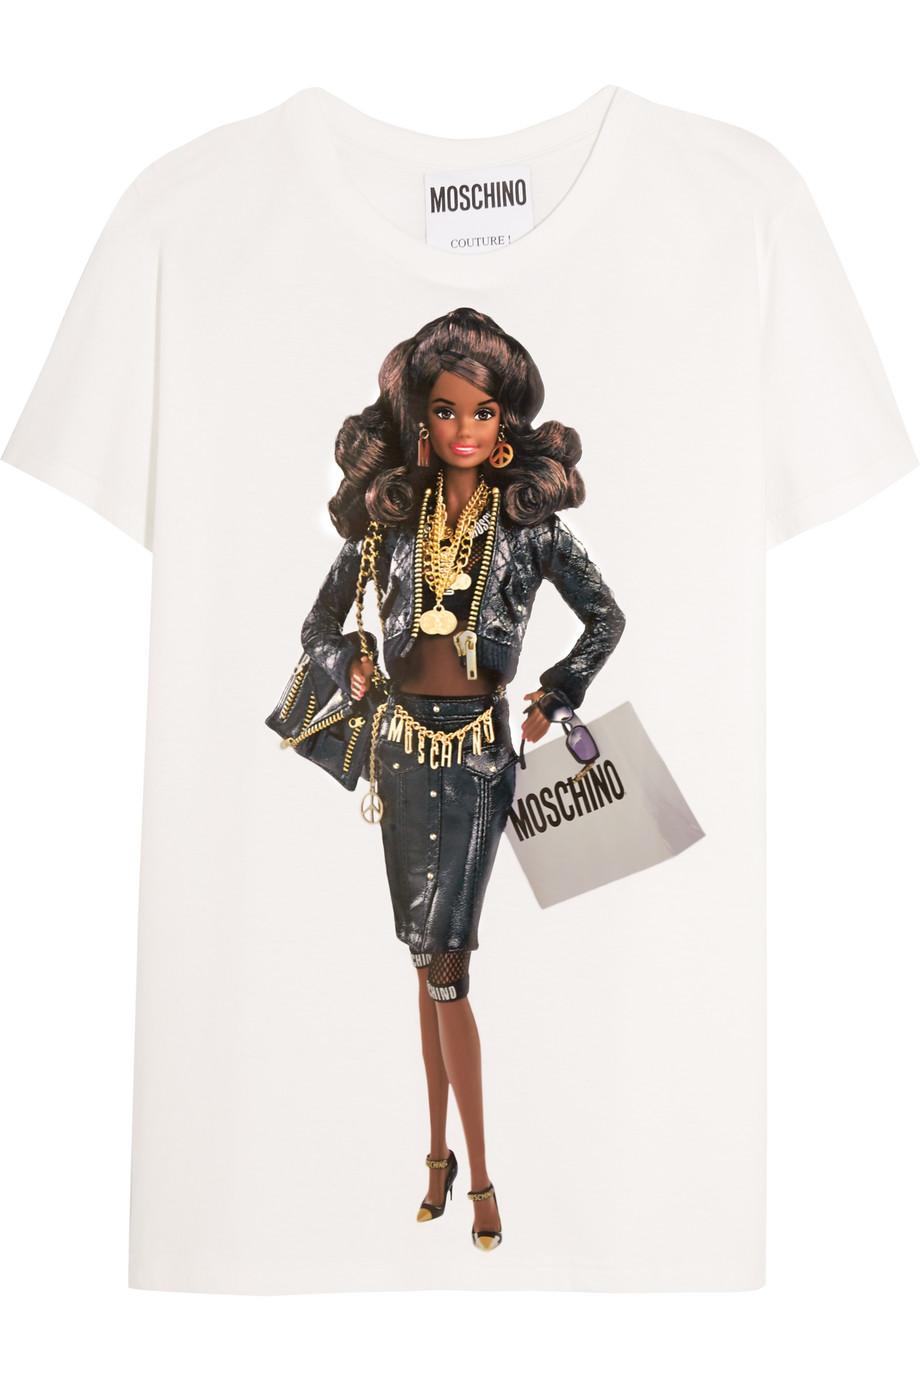 "Moschino Barbieâ""¢-Print Cotton-Jersey T-Shirt, White, Women's, Size: XS"